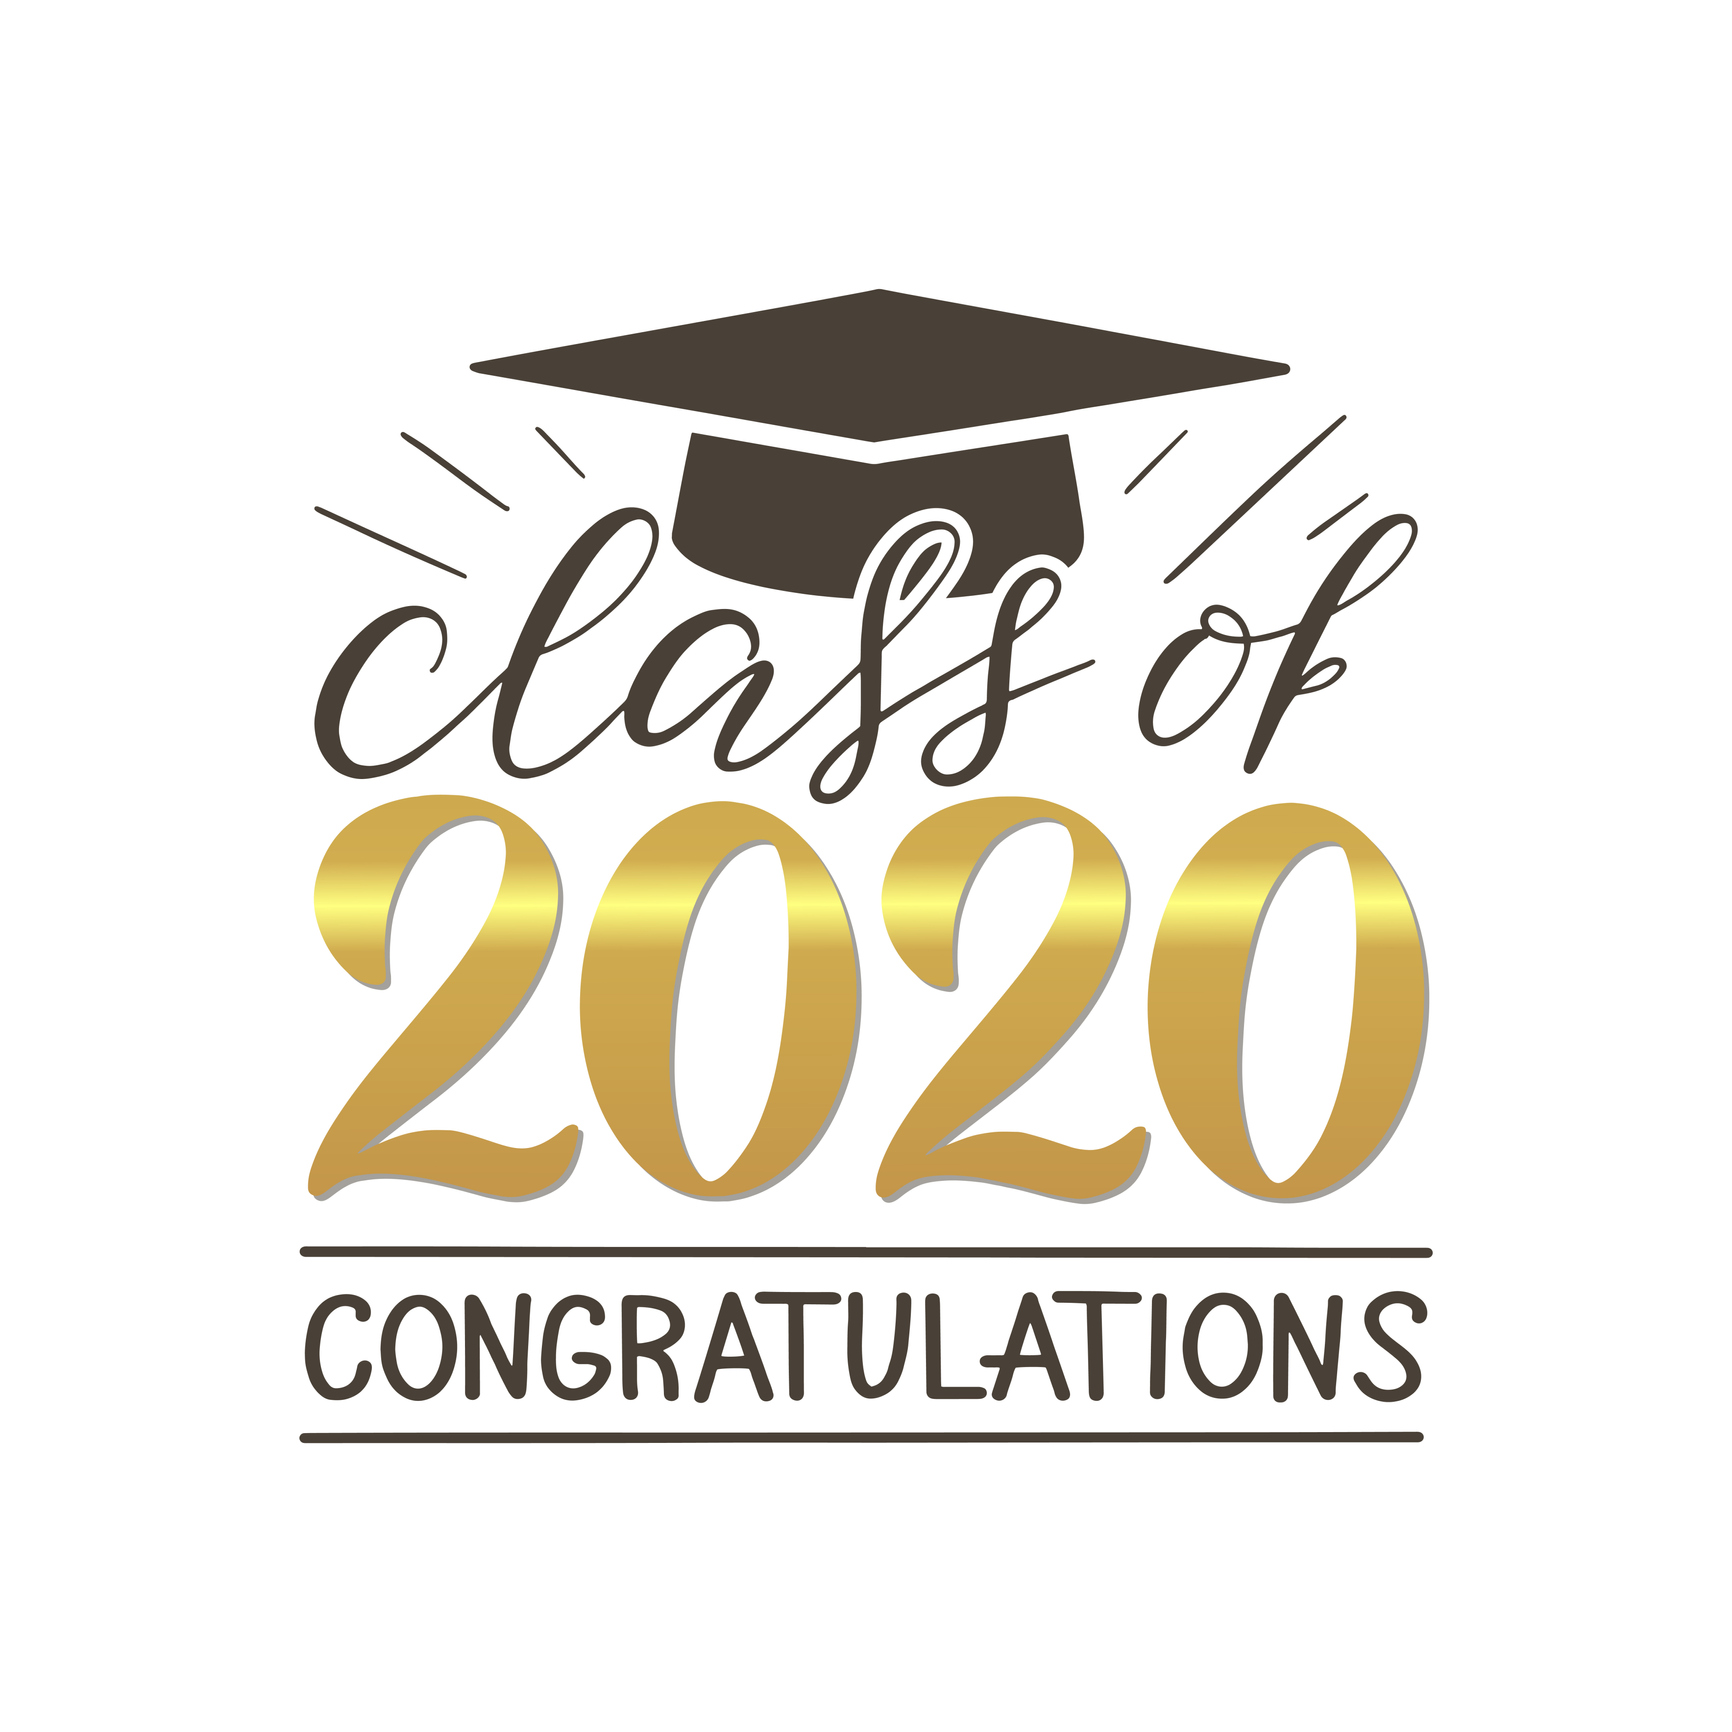 Cambridge Grads 2020